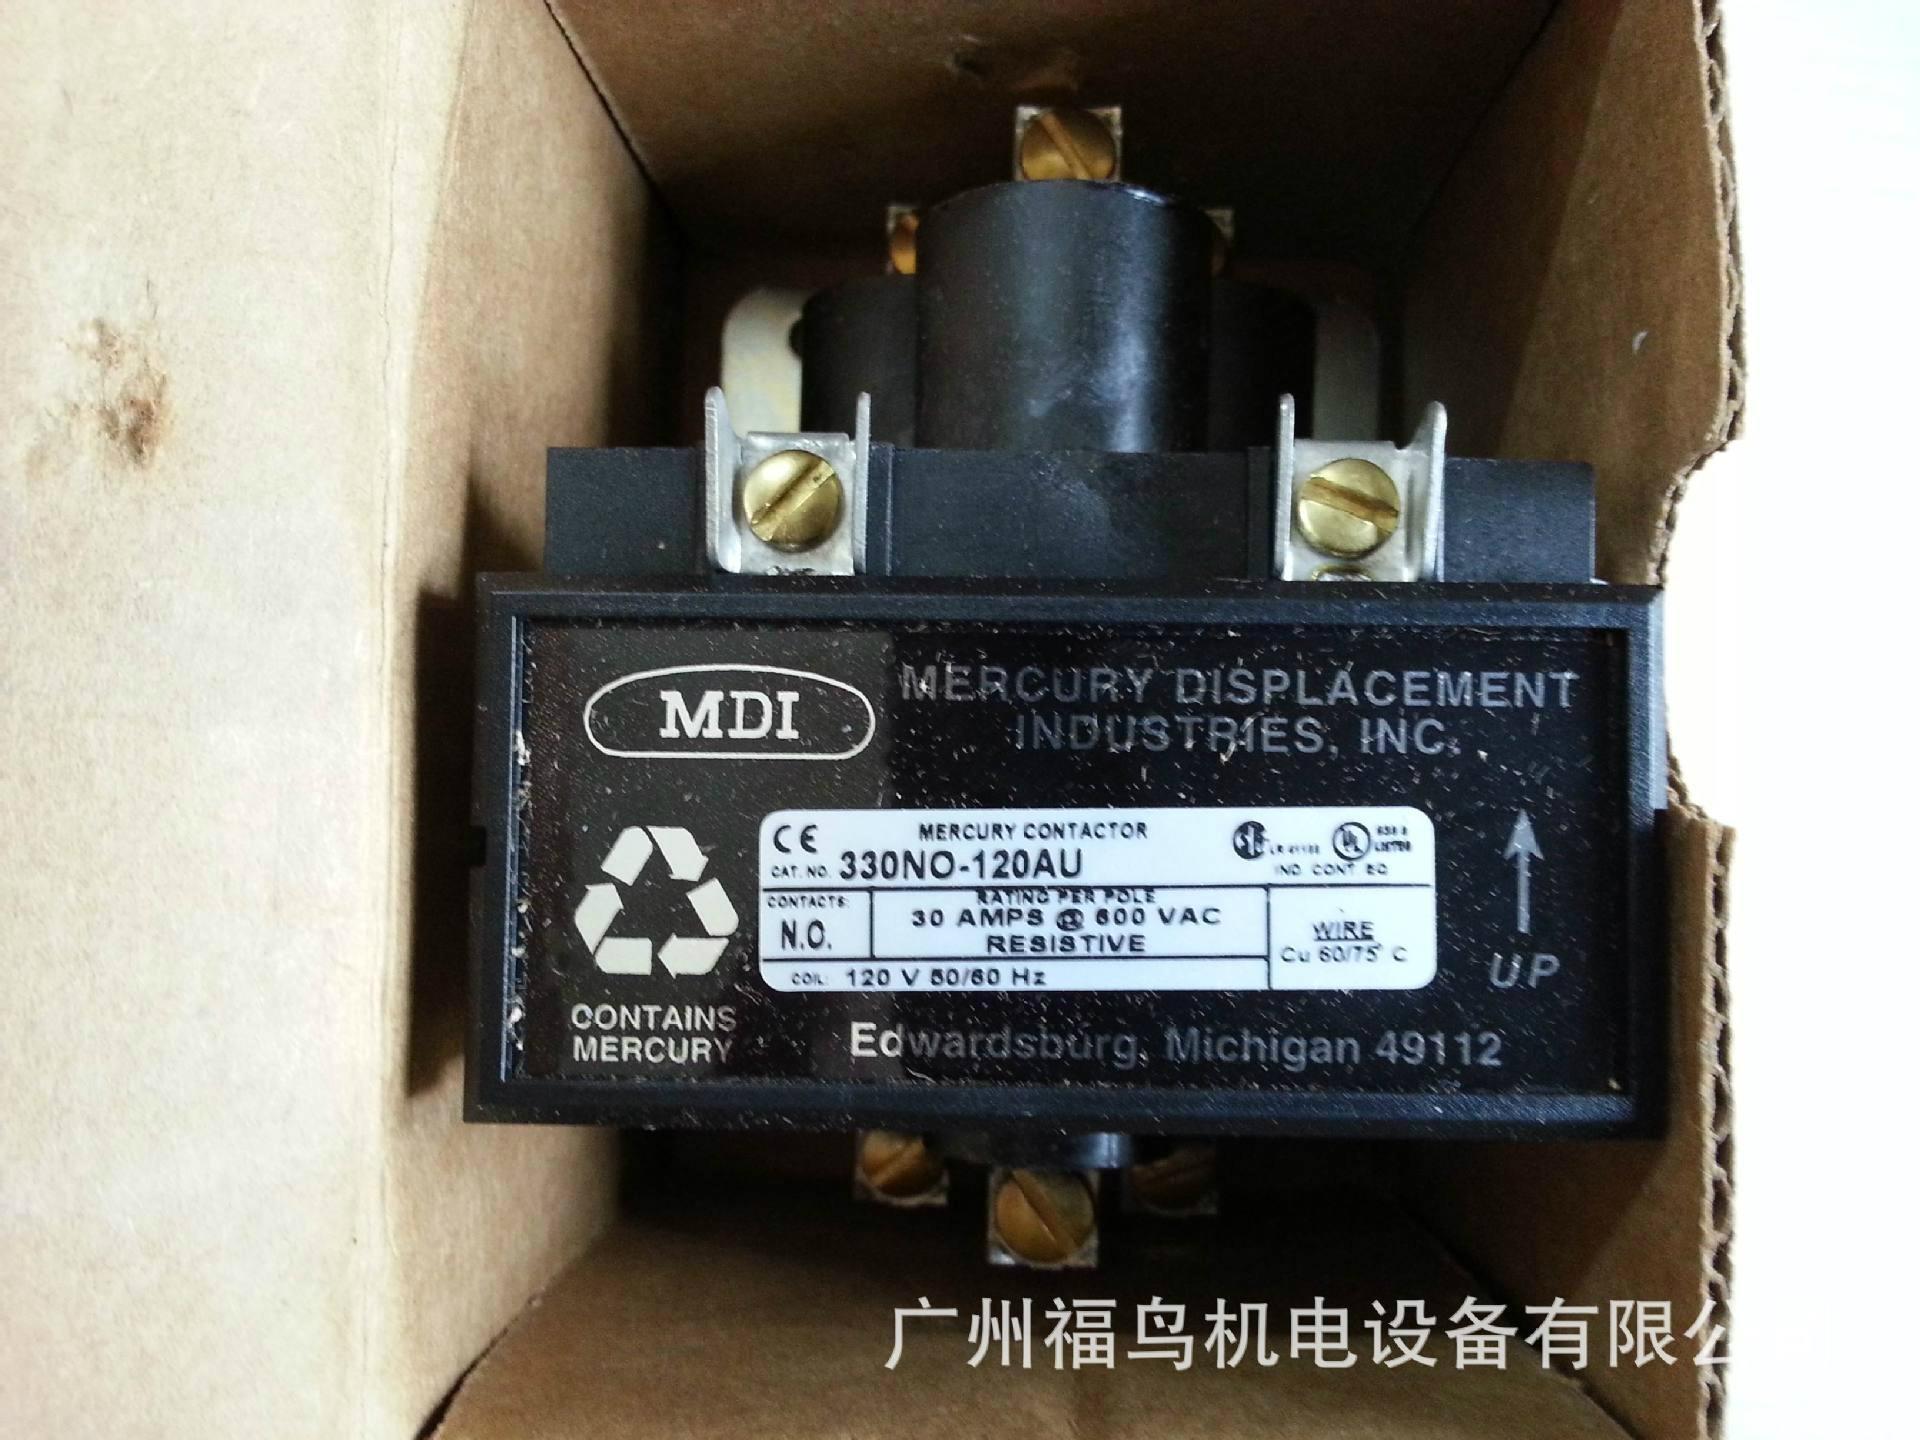 MDI水銀接觸器, 型號: 330NO-120AU